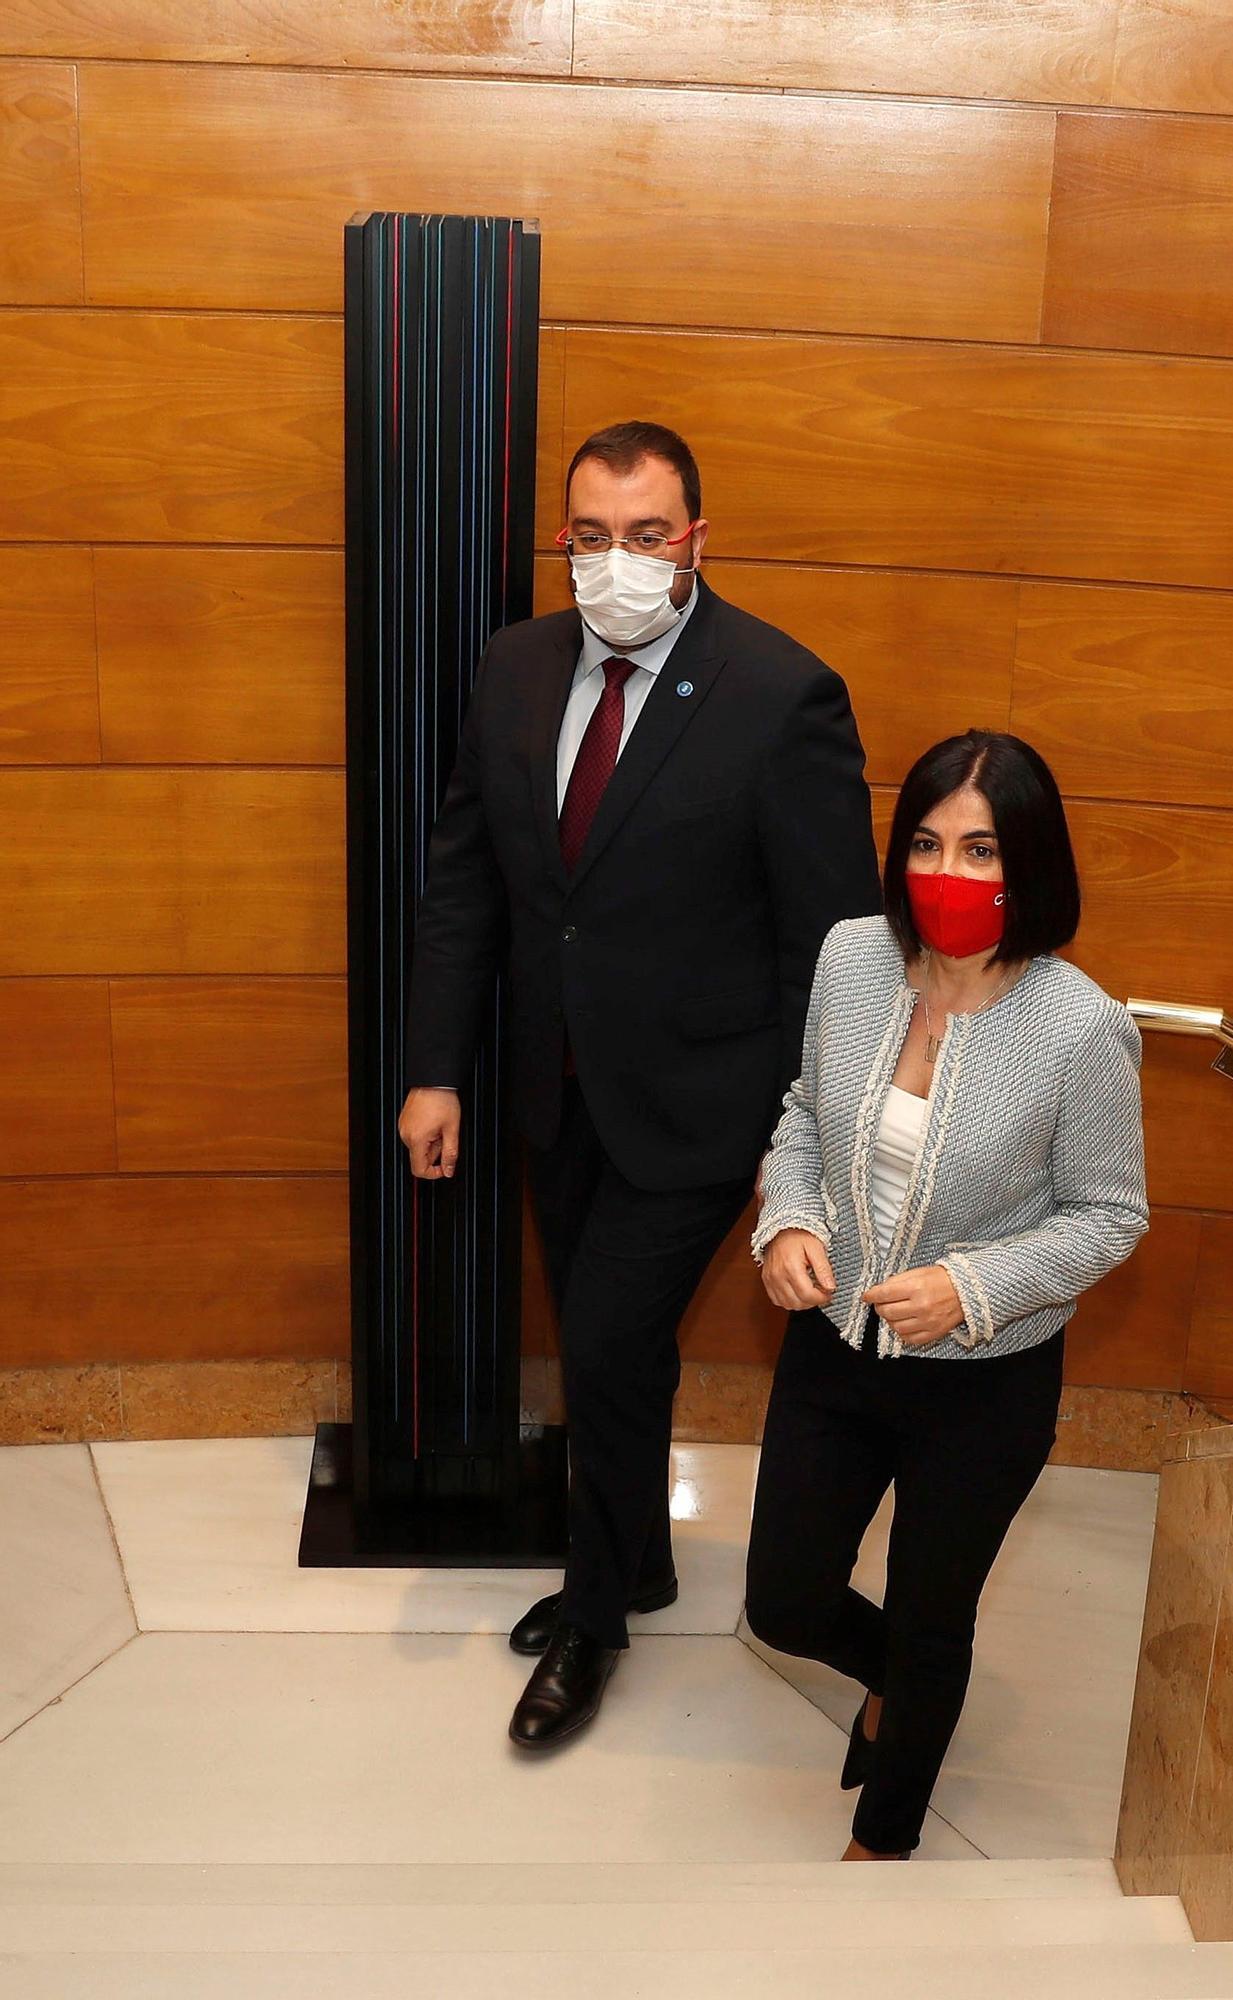 2021_05_03 Presidente visita ministra Sanidad 3.jpg